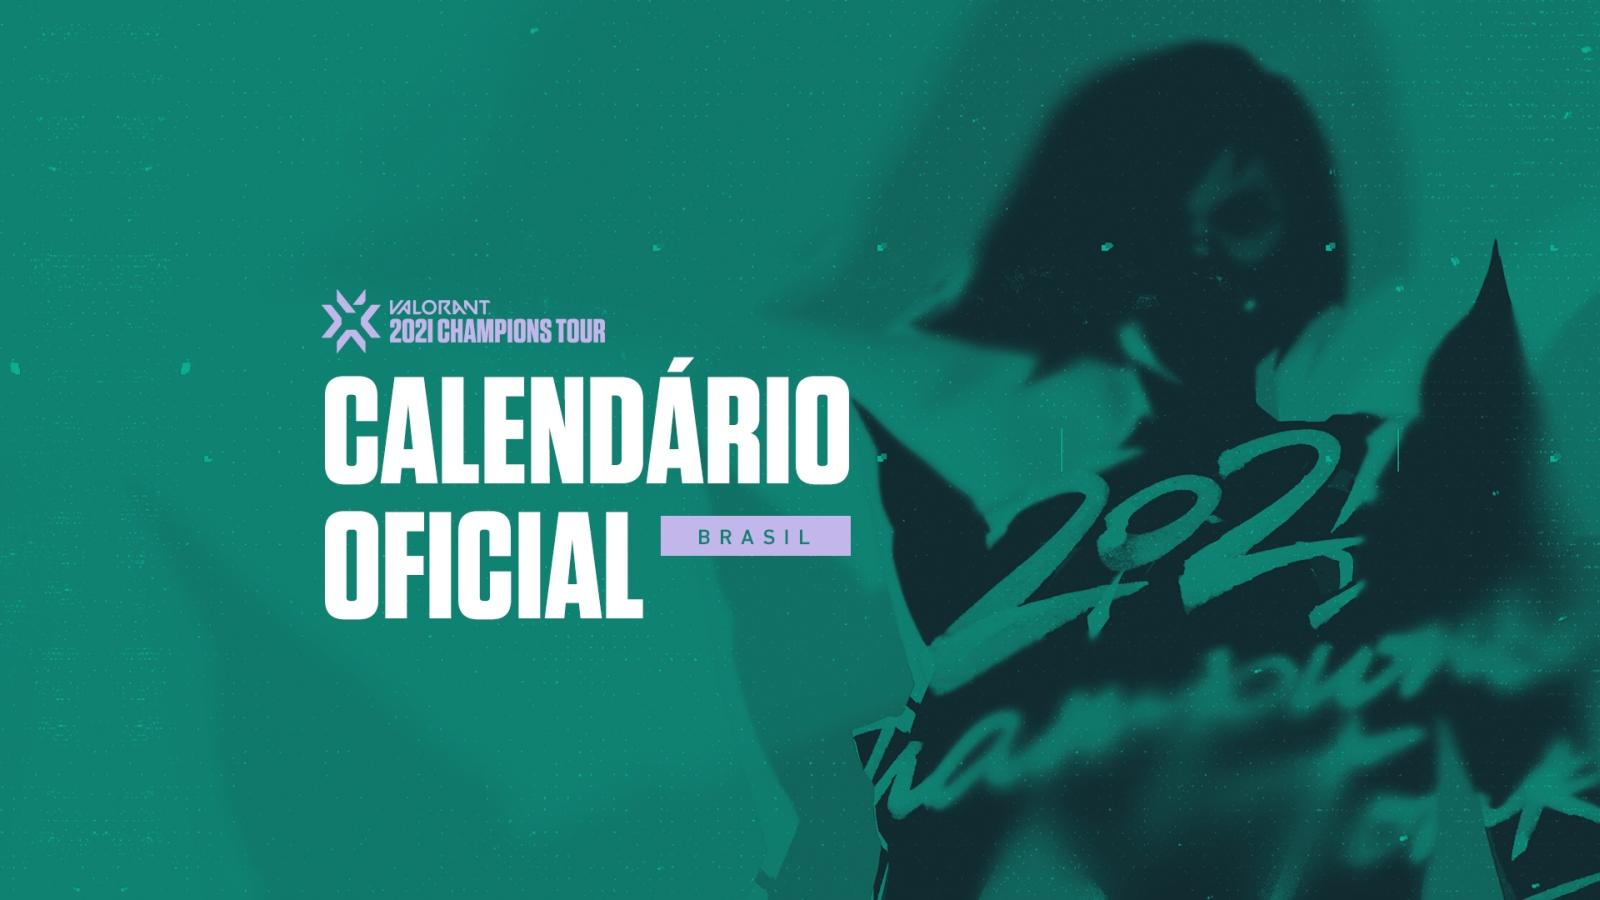 VALORANT Challengers Brazil - Etapa 1: Calendário Oficial